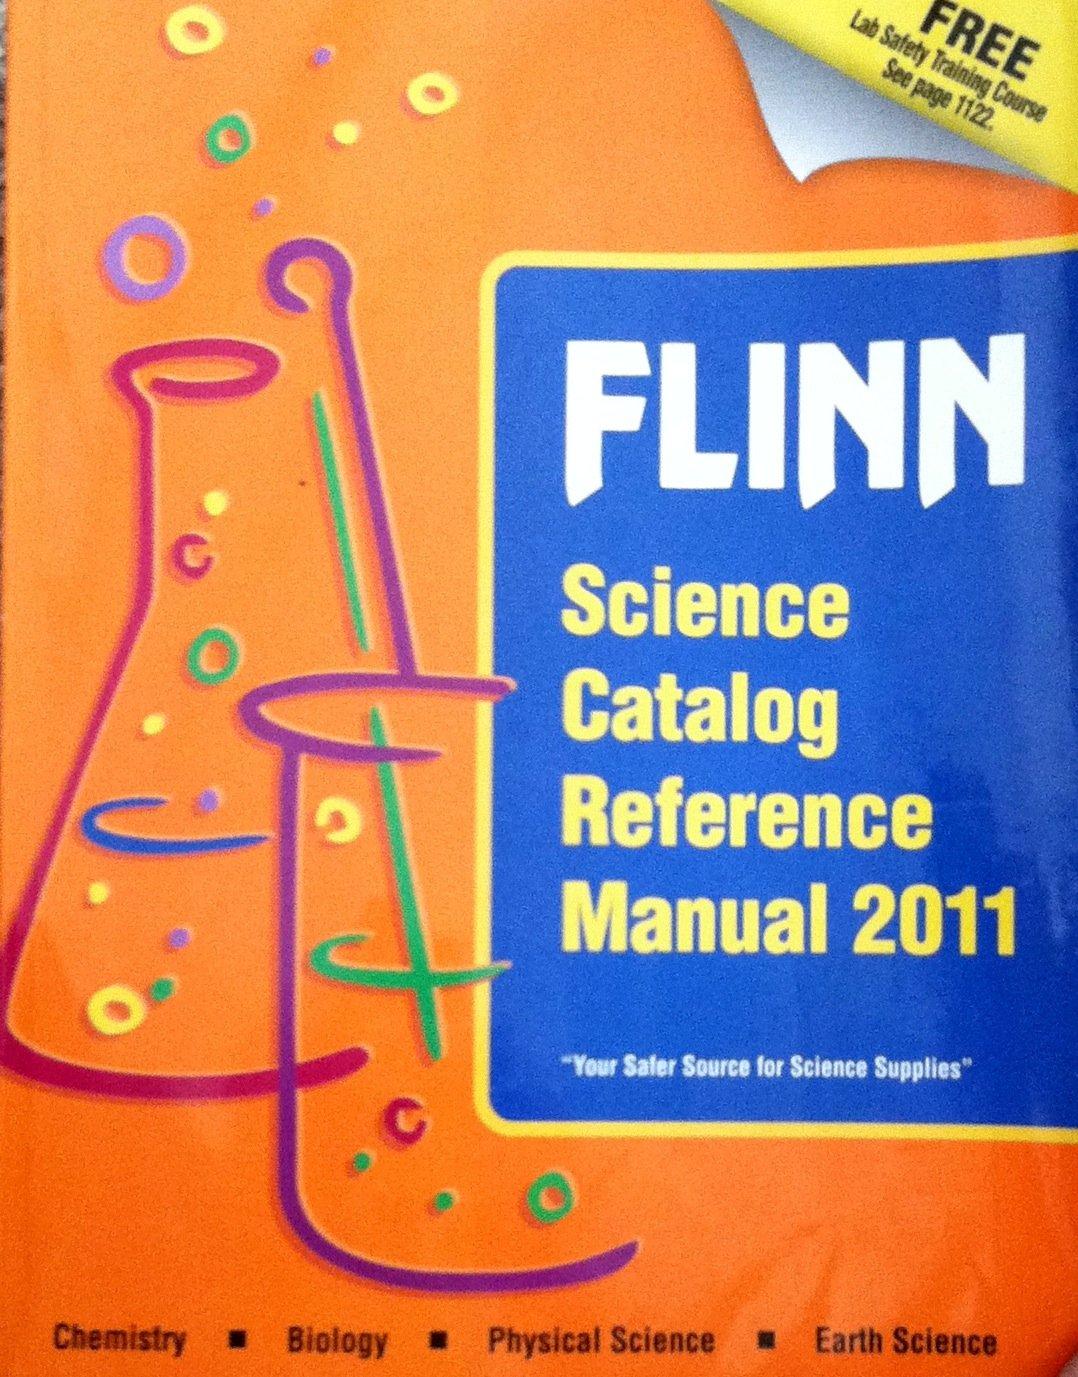 Flinn Science Catalog Reference Manual 2011: Larry Flinn, Pat Flinn:  9781933709246: Amazon.com: Books